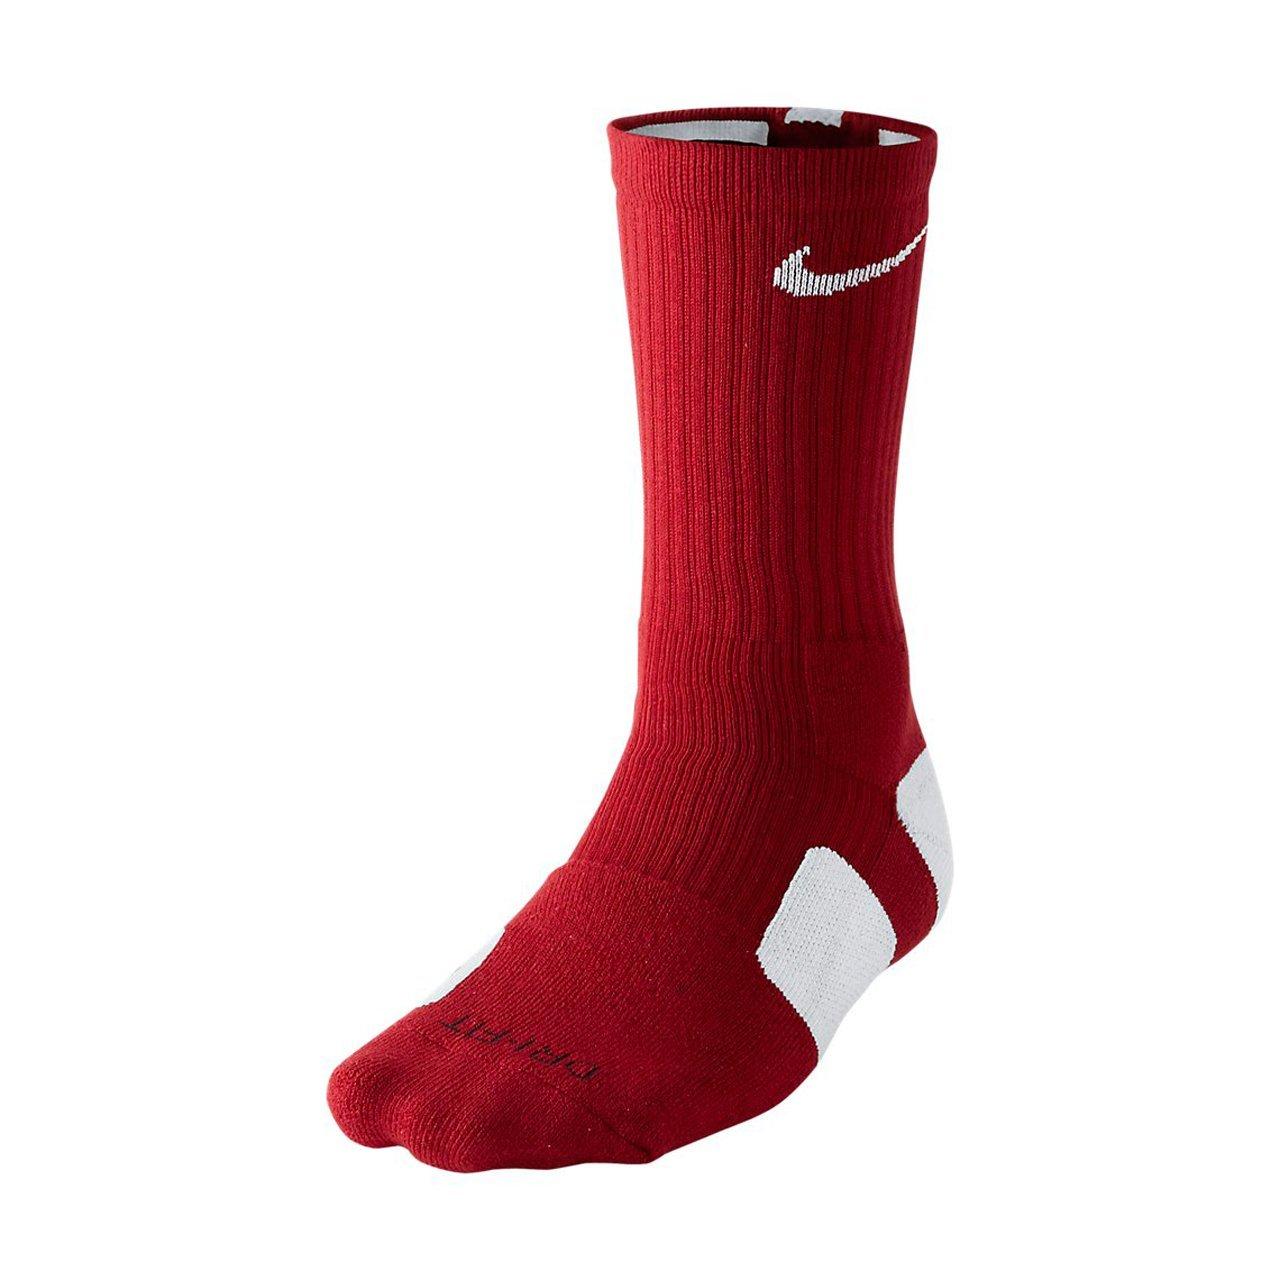 f457fdf59b4ff Cheap Red Nike Elite Socks, find Red Nike Elite Socks deals on line ...